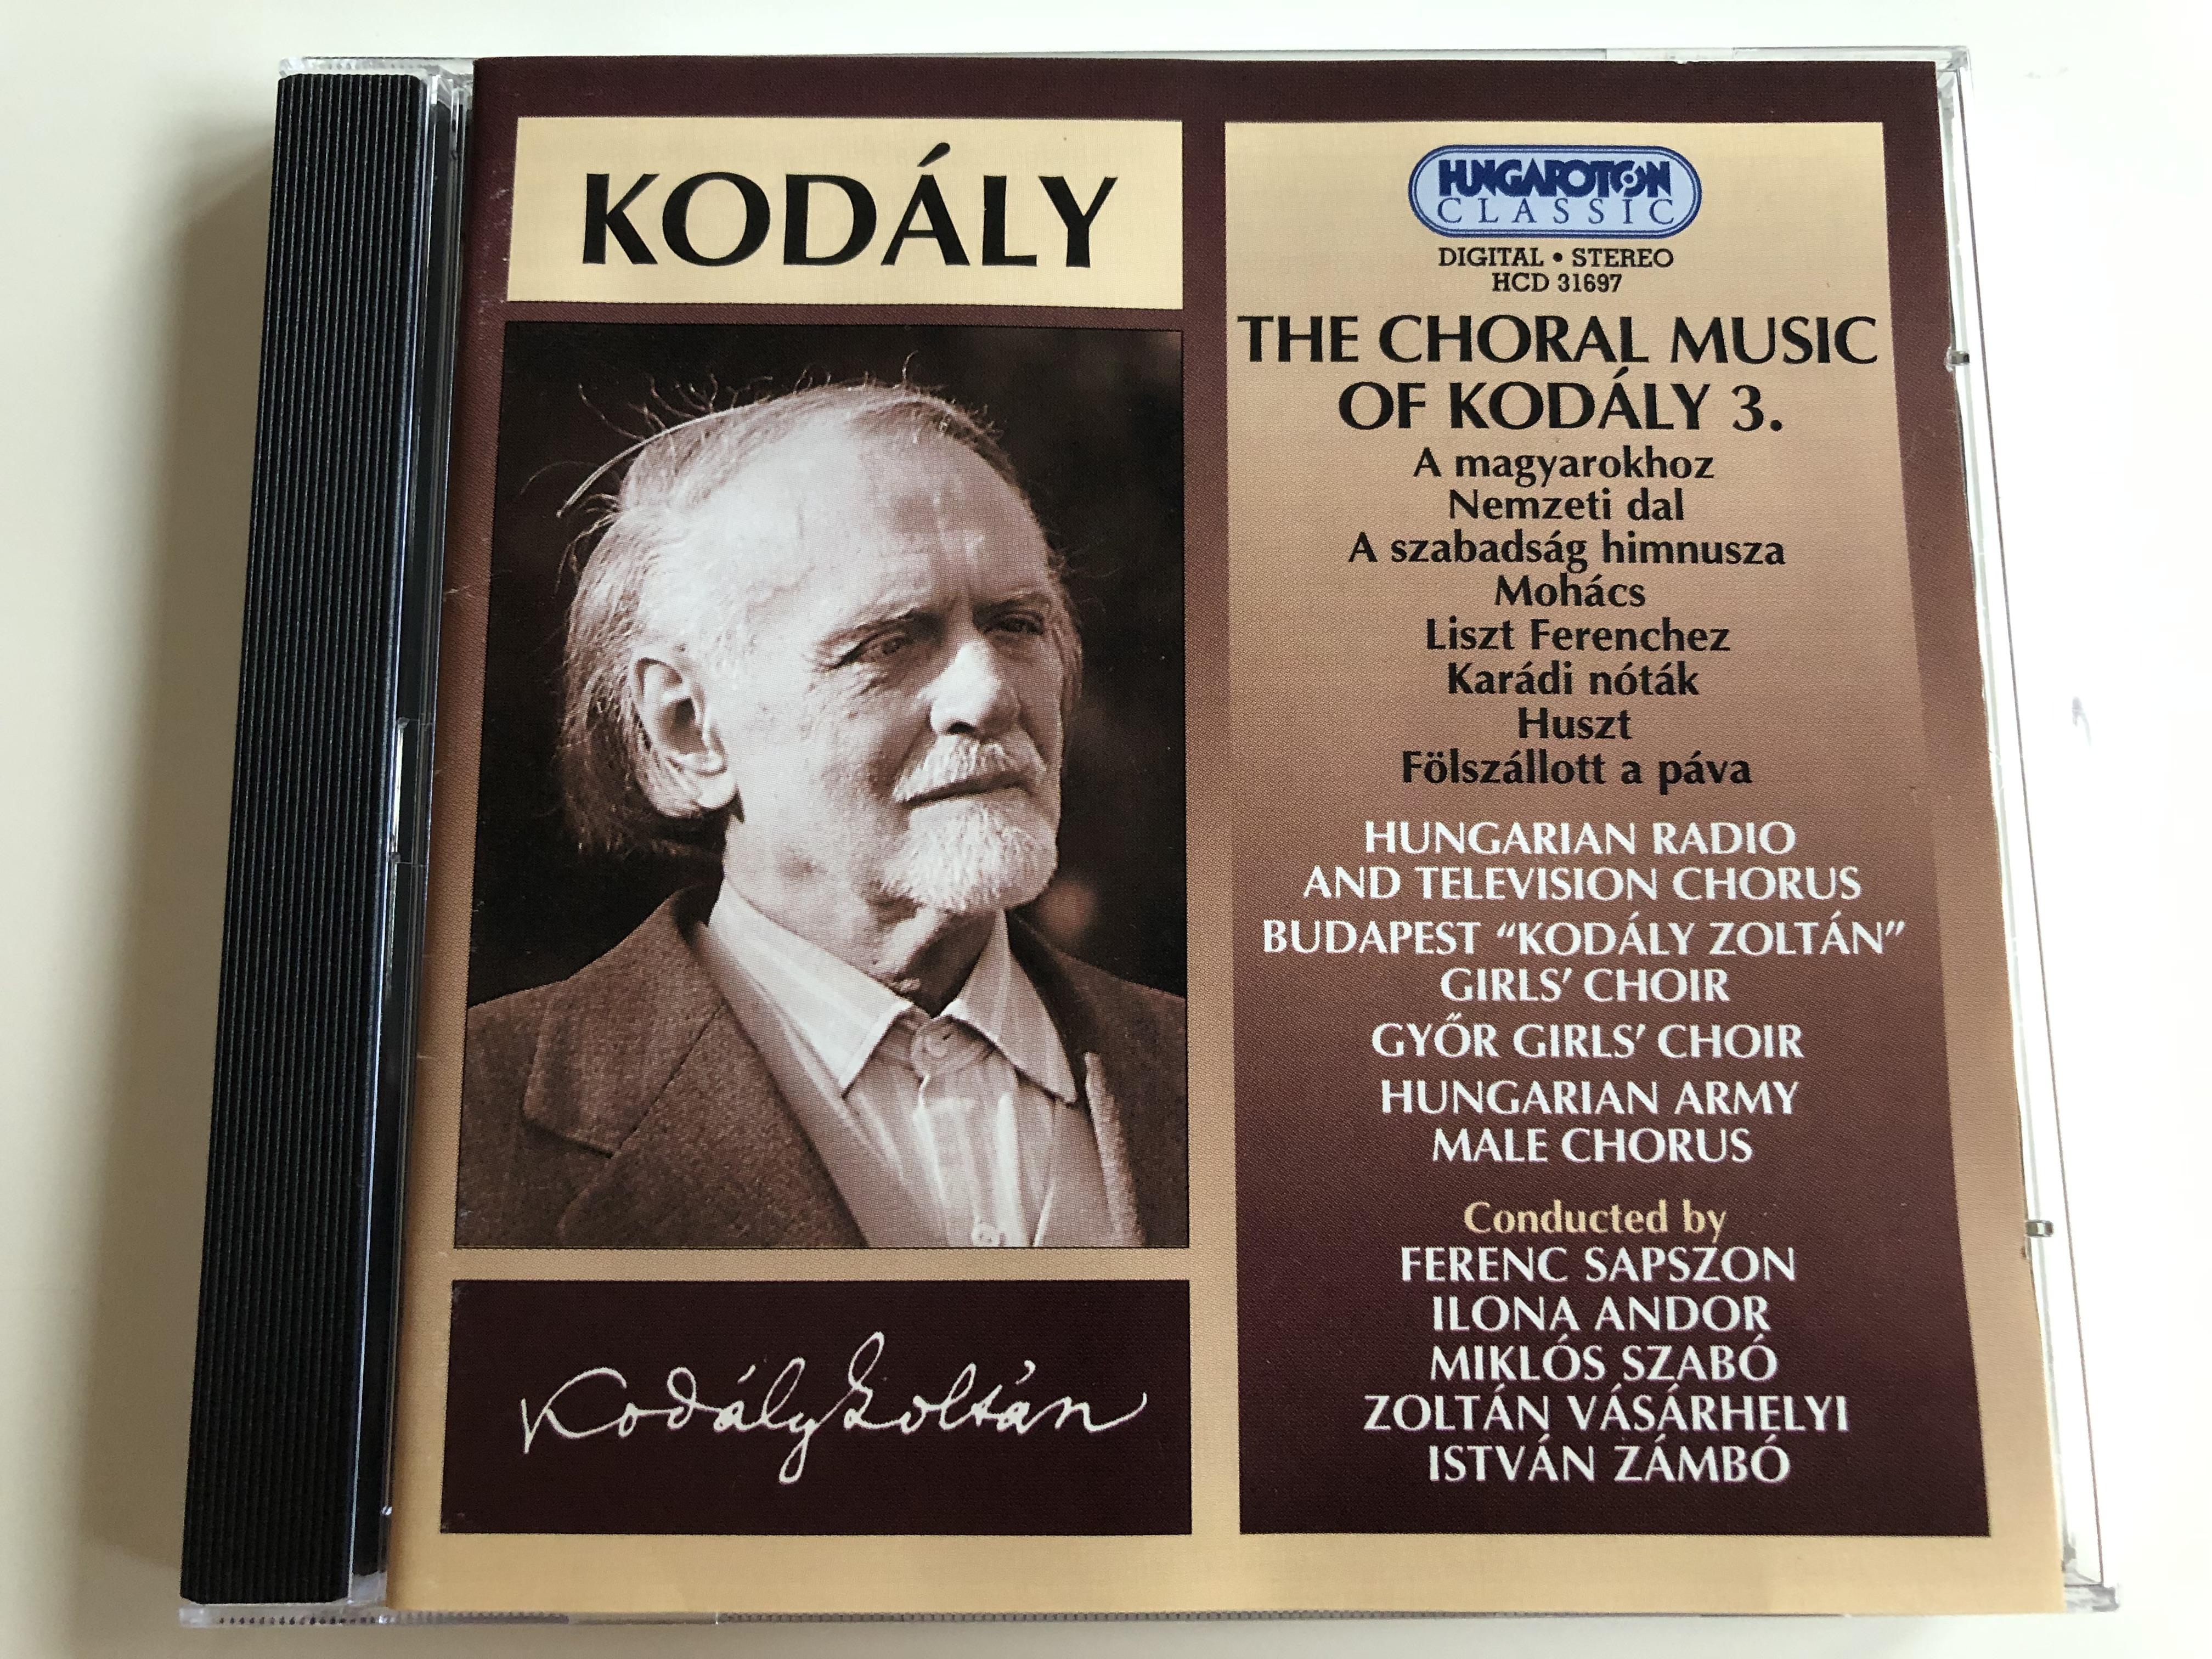 kod-ly-choral-music-vol.-3-audio-cd-1997-a-magyarokhoz-nemzeti-dal-moh-cs-liszt-ferencnek-hungarian-rtv-chorus-budapest-kod-ly-girl-s-choir-gy-r-girls-choir-hungarian-army-male-chorus-conductors-ferenc-sapszon-ilon-1-.jpg